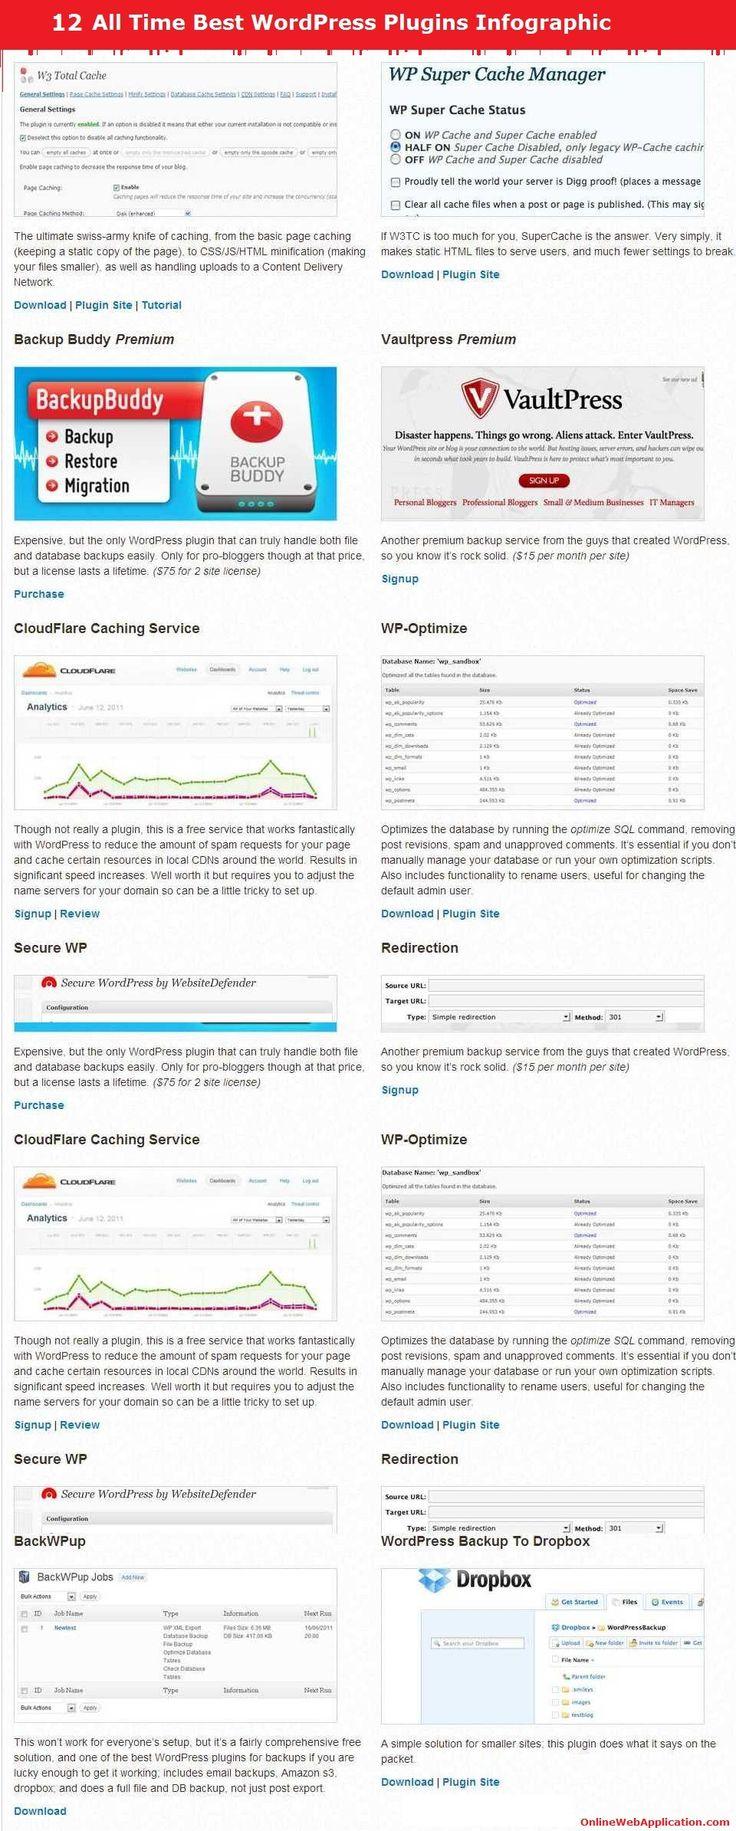 Best Wordpress Plugins Infographic